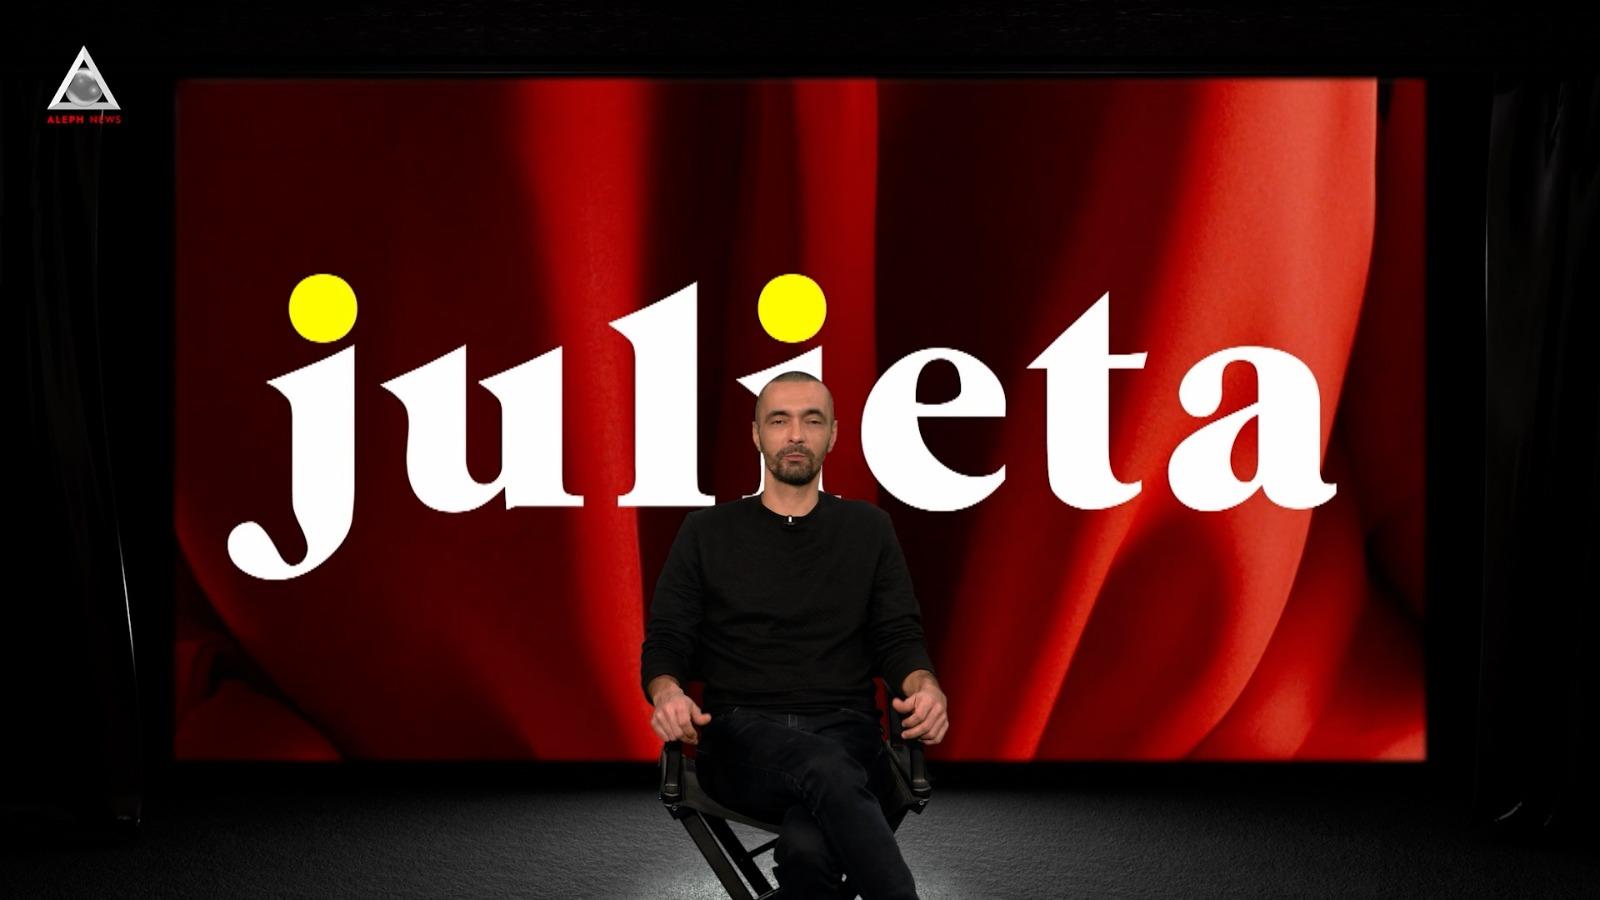 CINEMAleph. Julieta